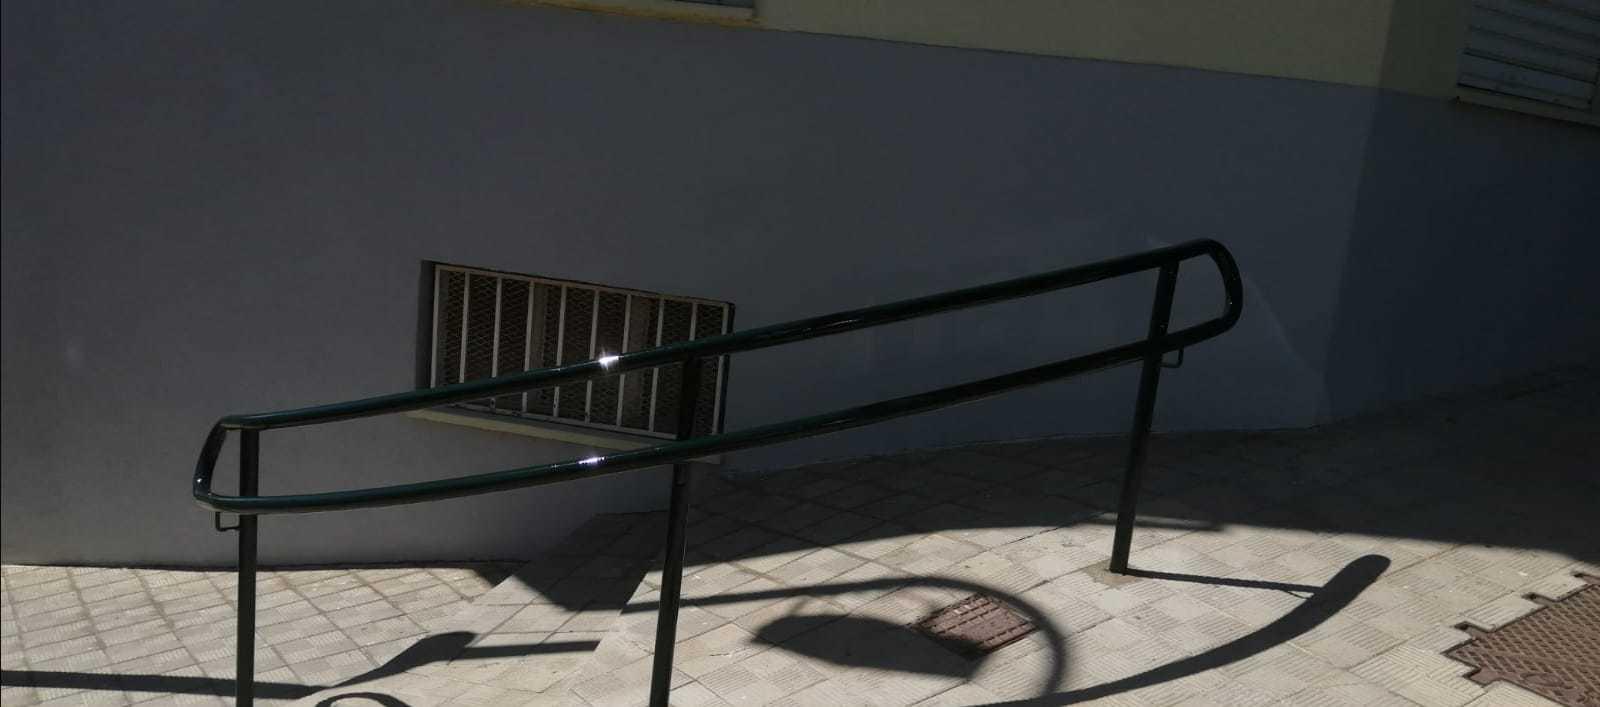 Santa Cruz de Tenerife. Obras sureste